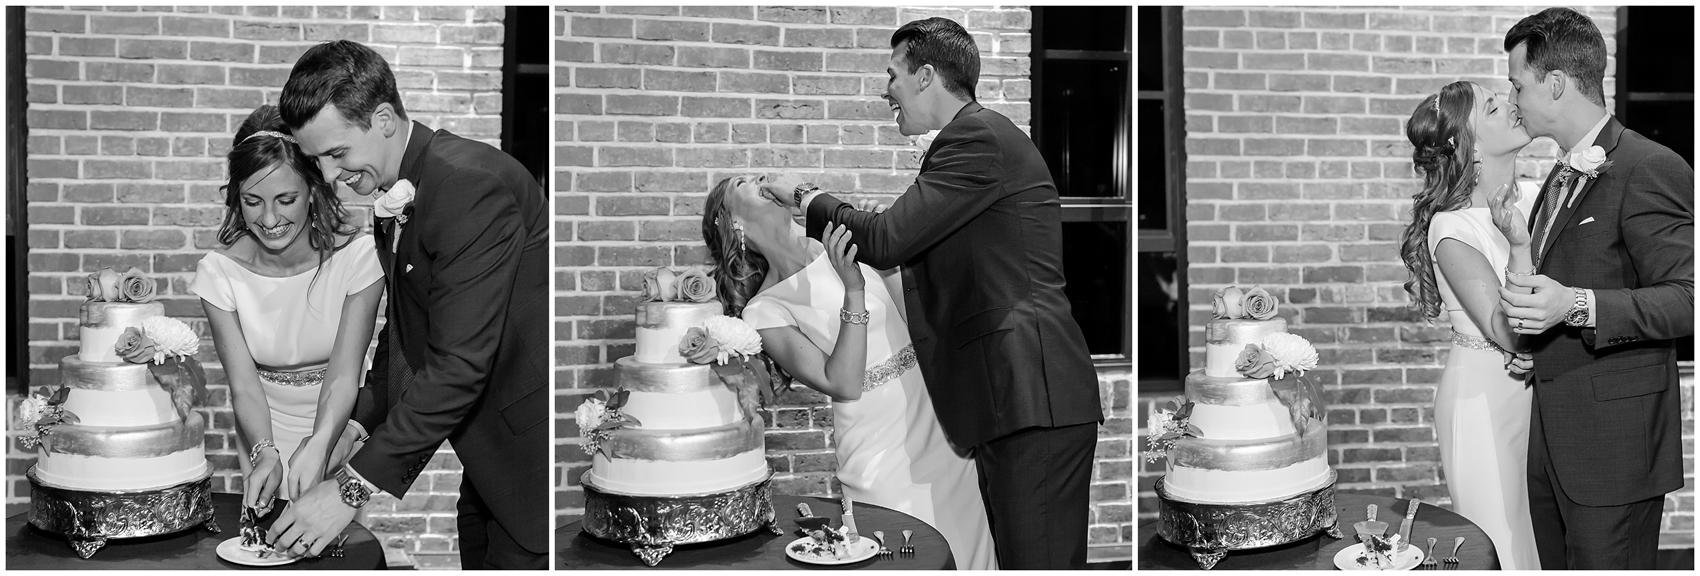 ritz-carlton-georgetown-wedding-washington-dc-photography-liz-stewart-photo-00052